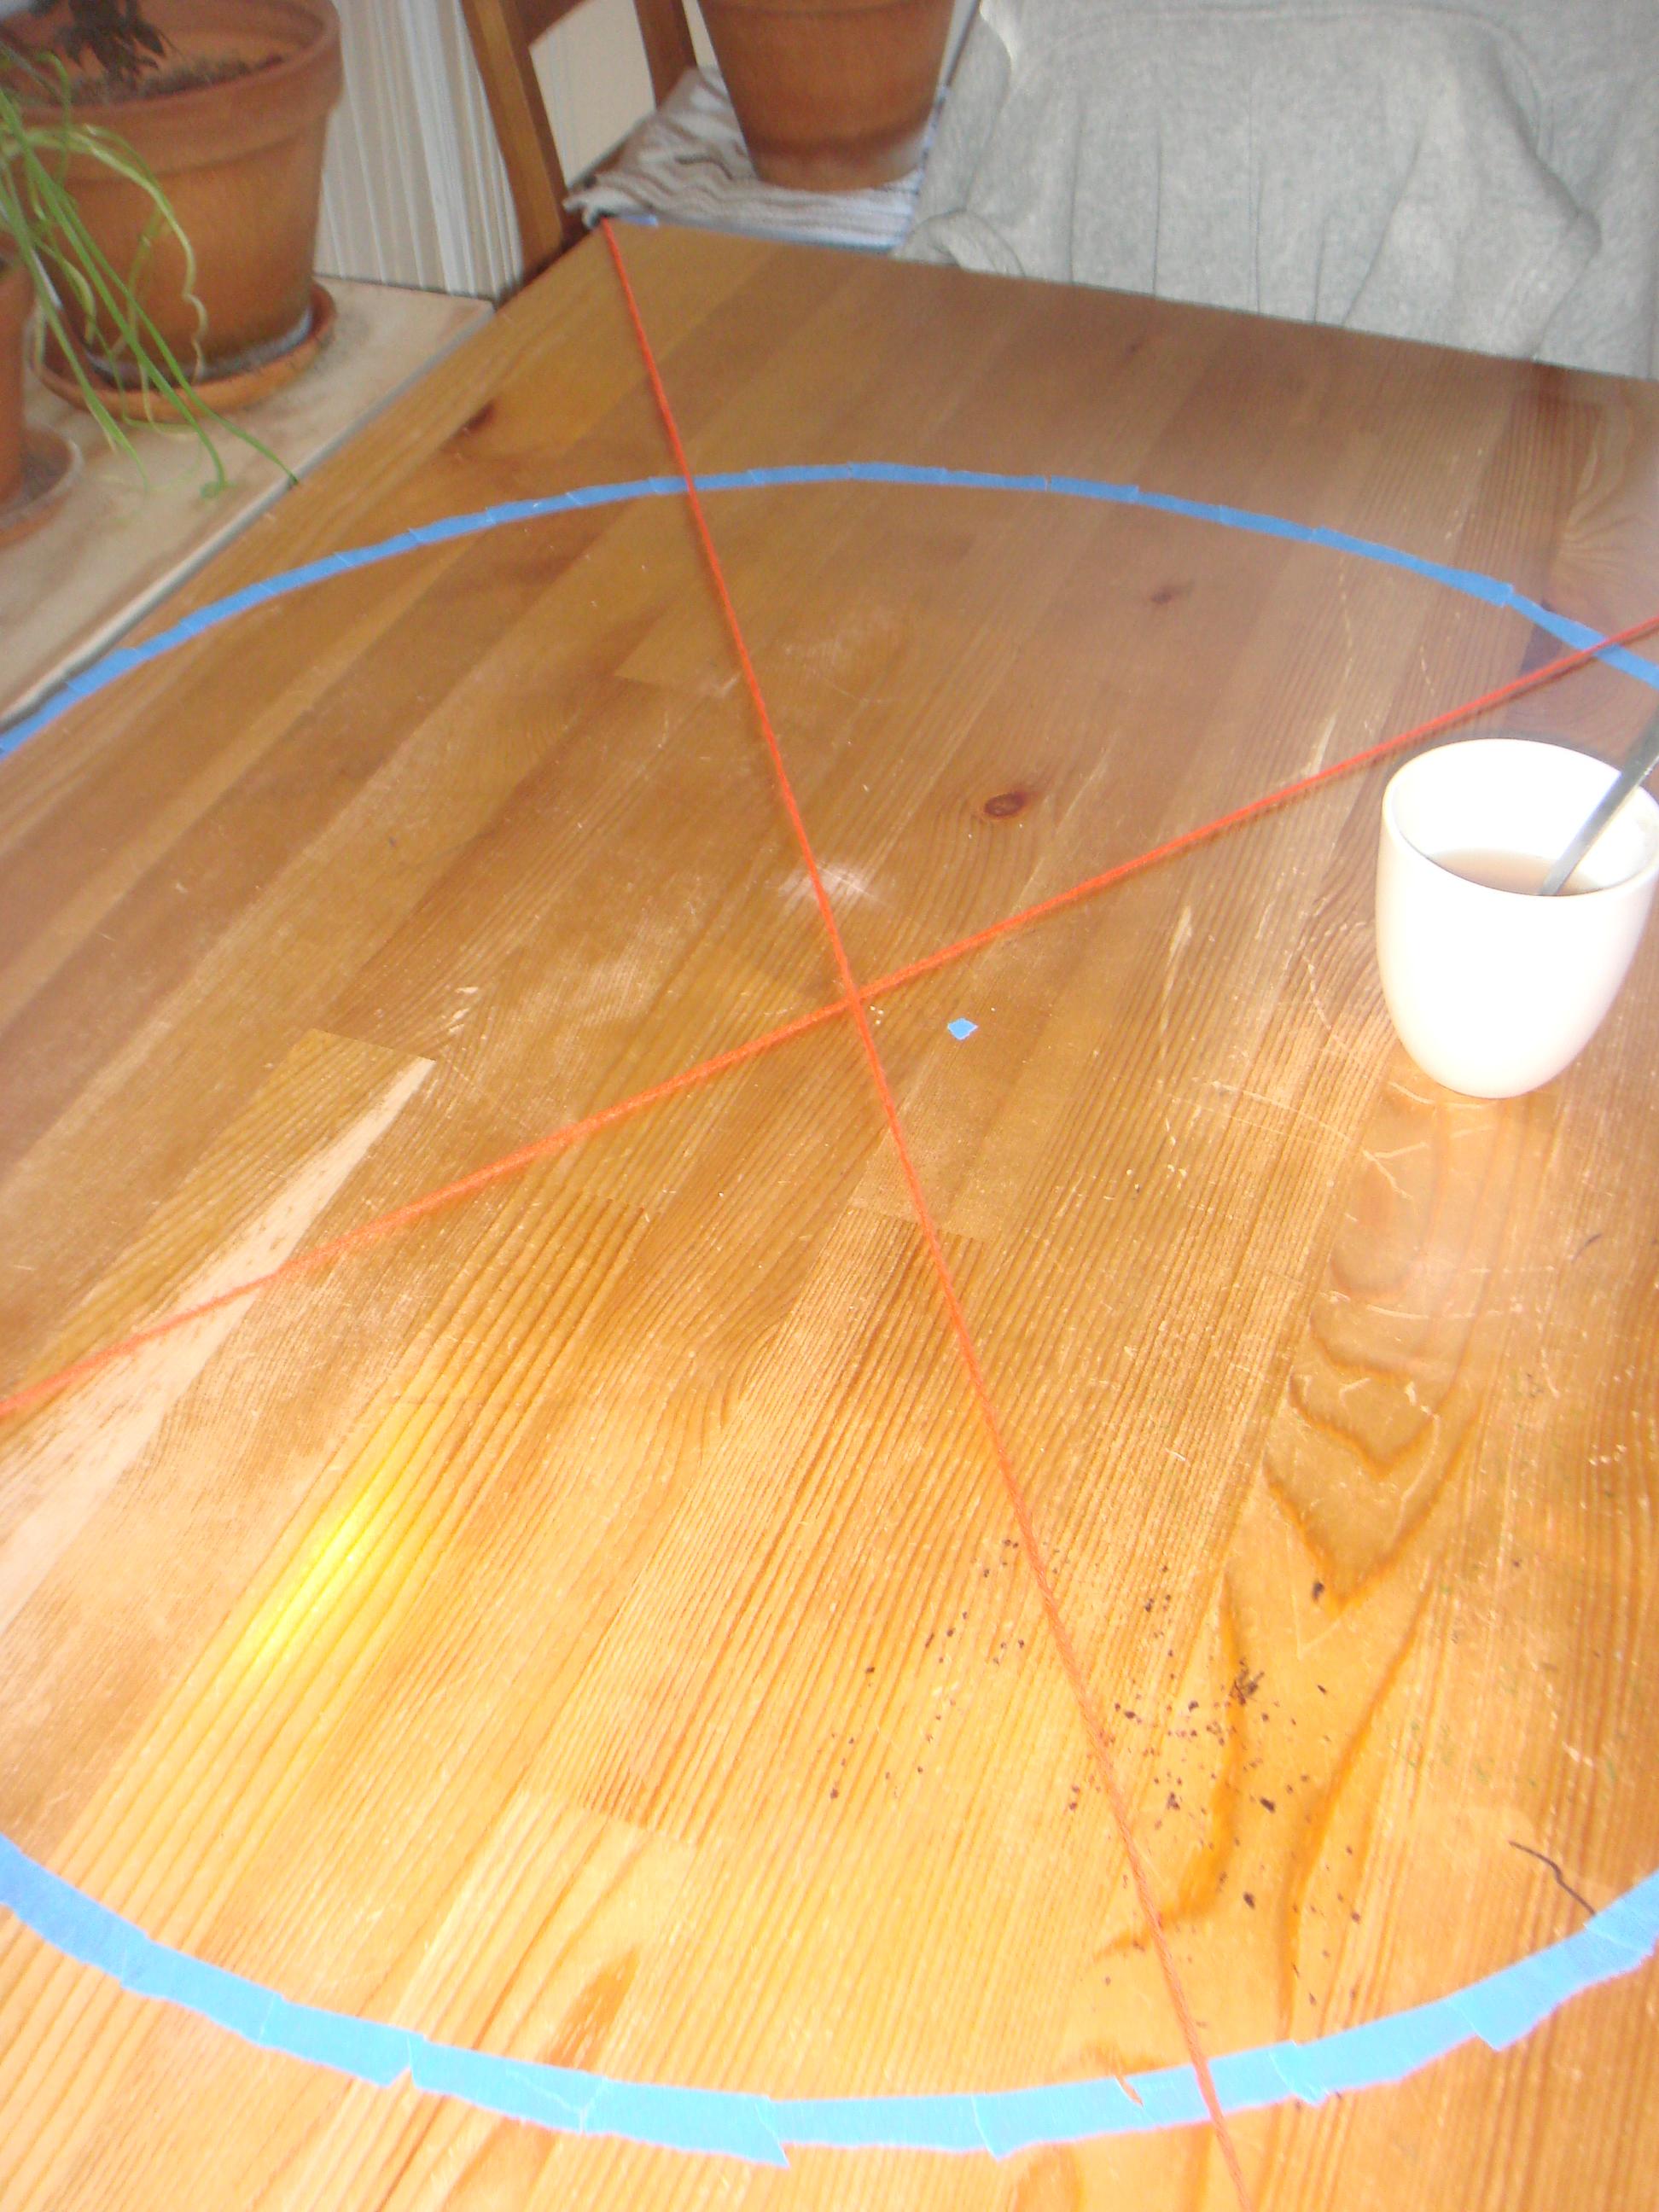 Finding Diameter Radius And Circumference